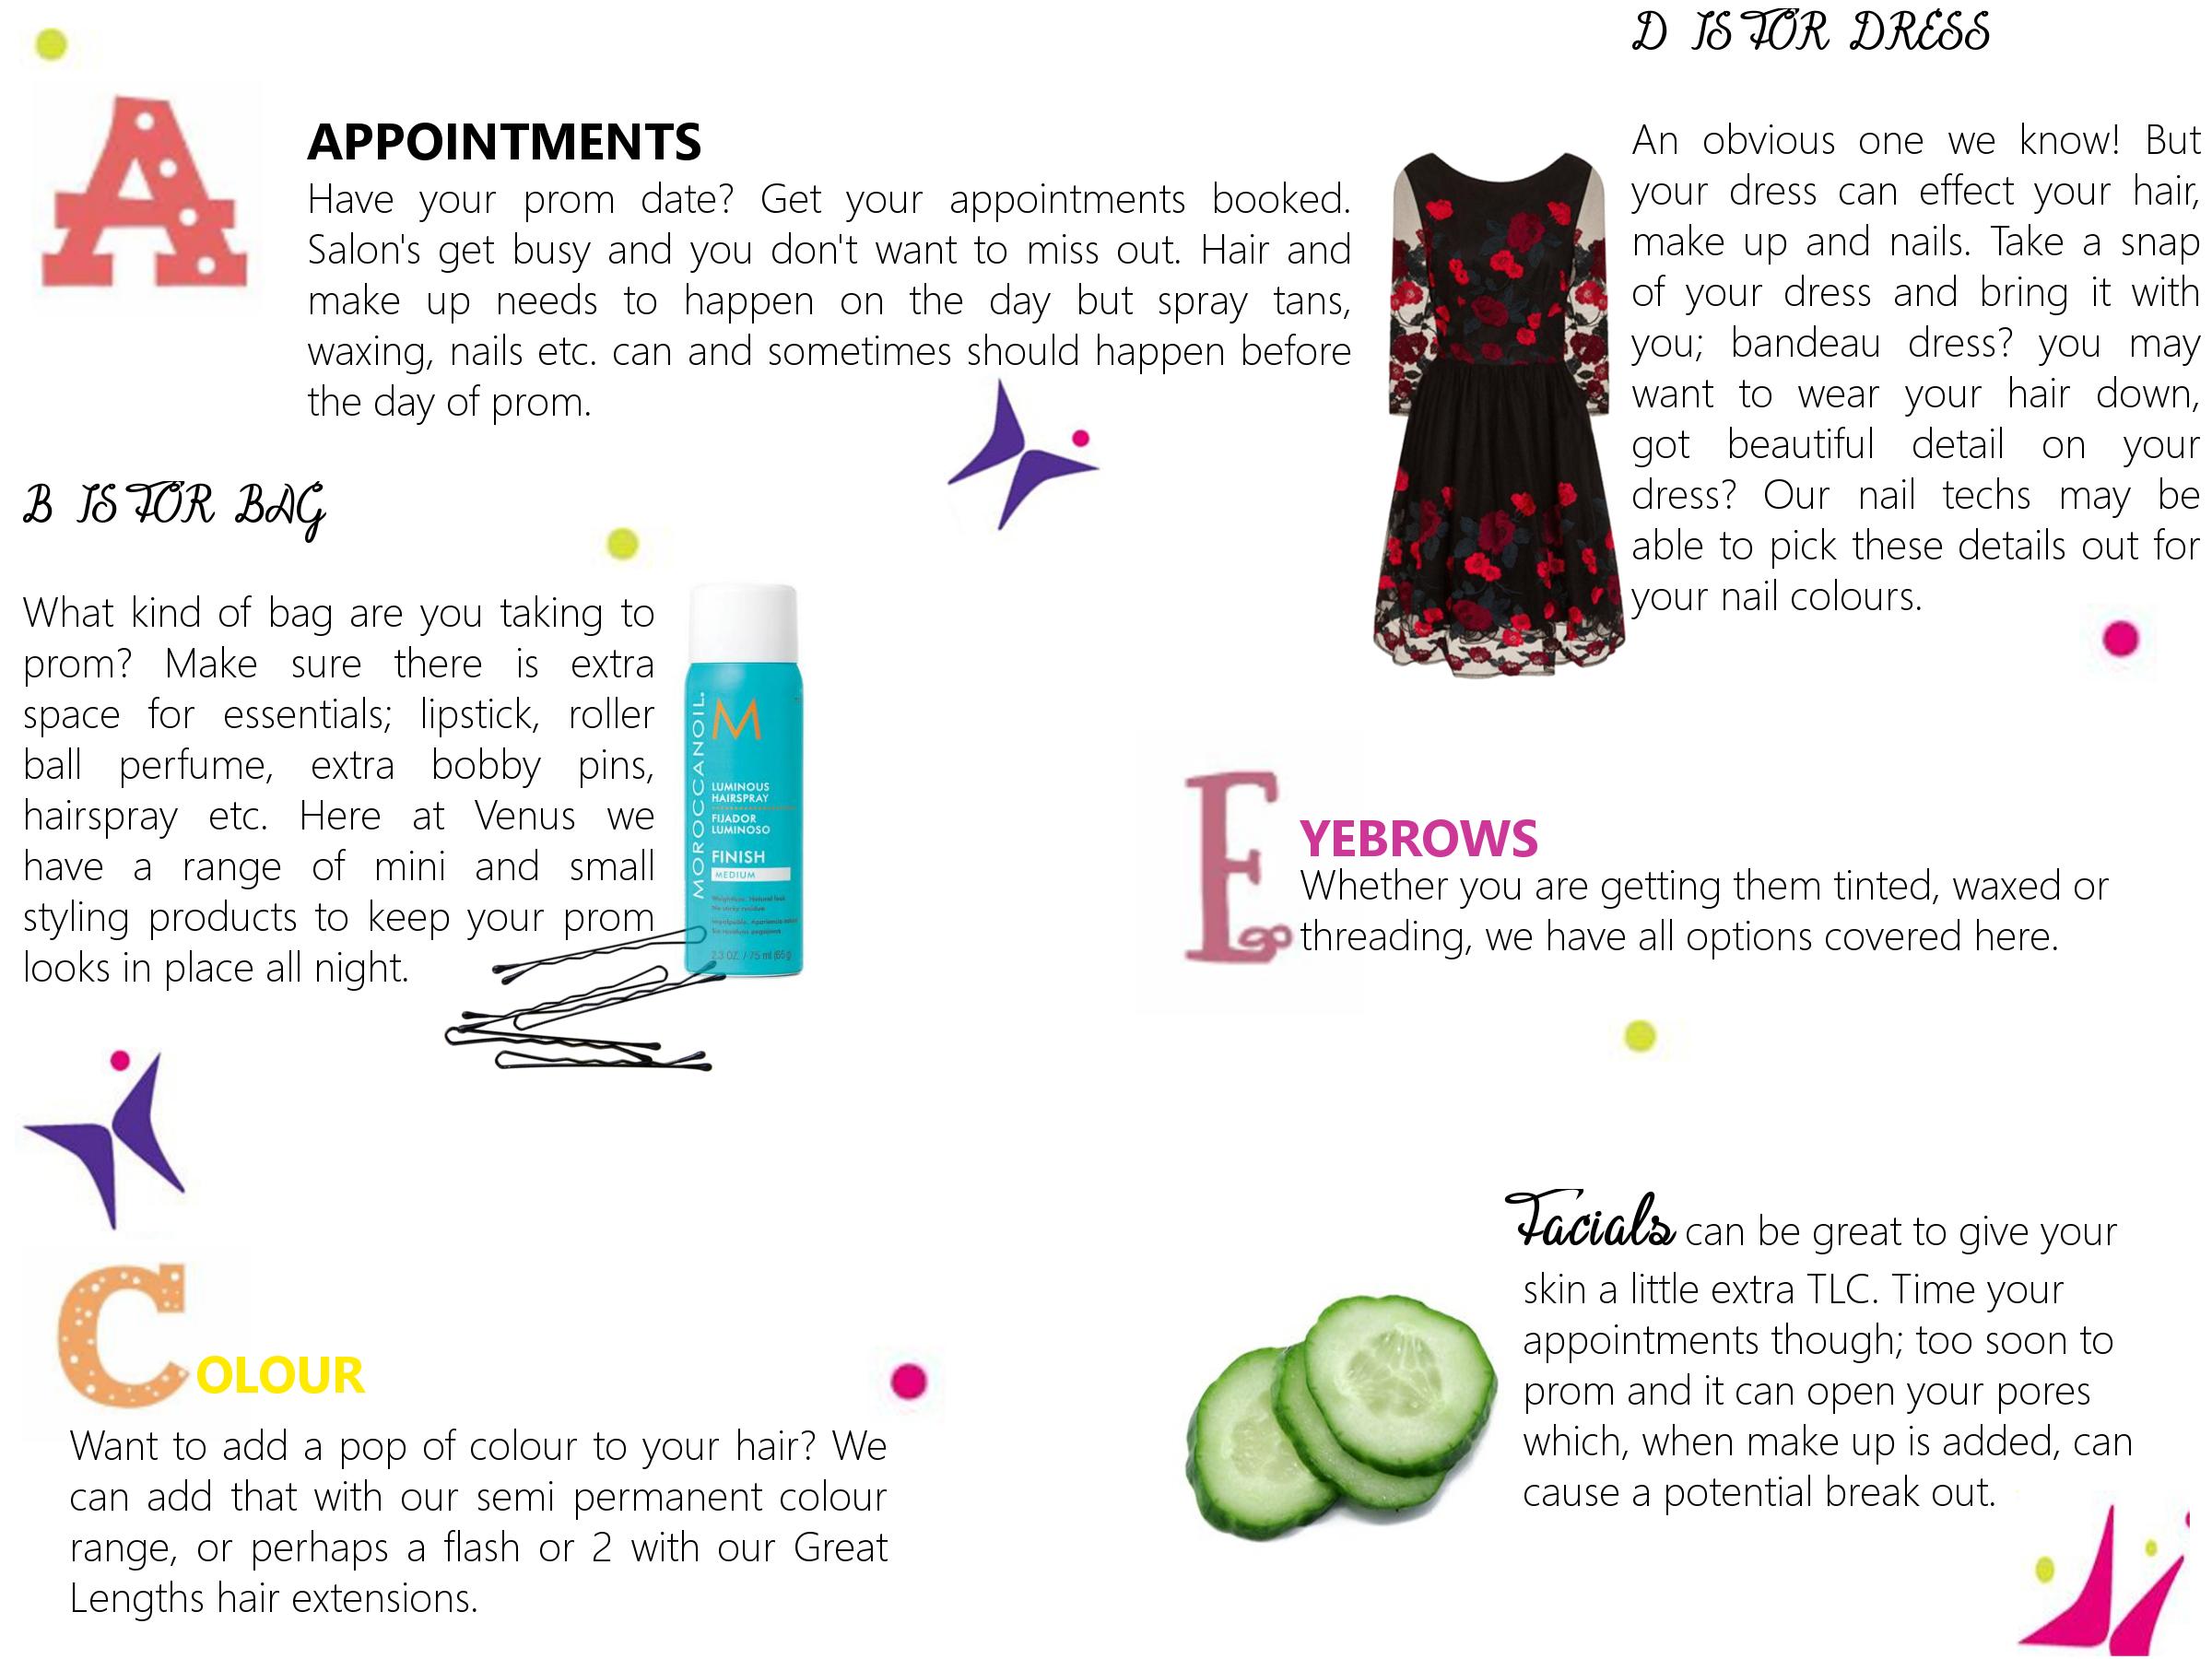 Venus-Beauty-Hair-Salon-Tavistock-Devon-Hair-Stylists-Beauty-Therapists-Prom-A-F.PNG